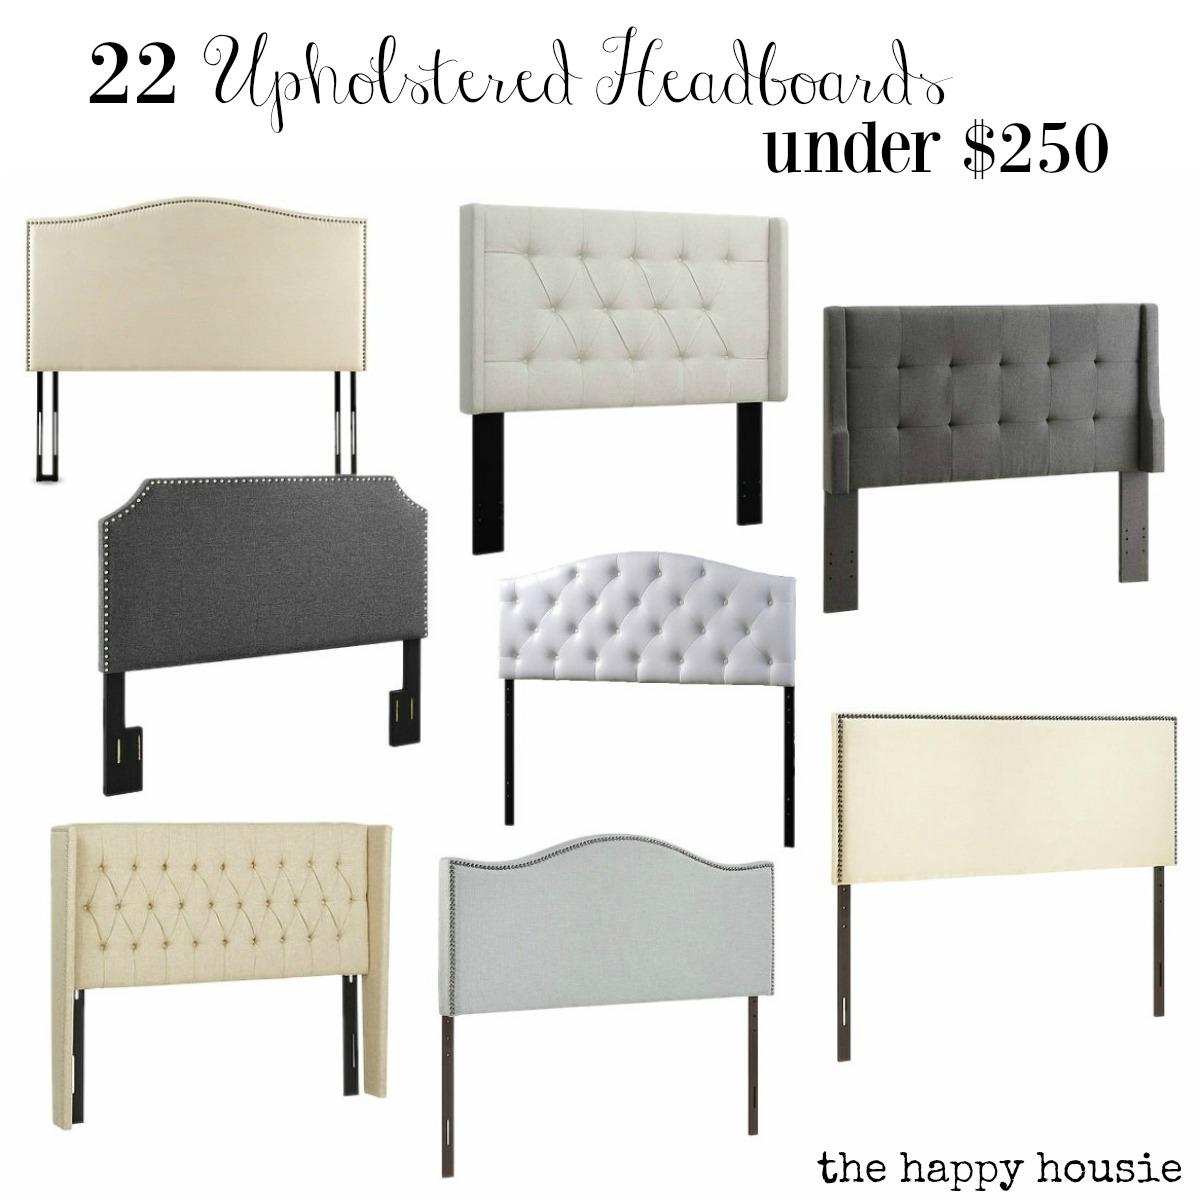 22-upholstered-headboards-under-250-each